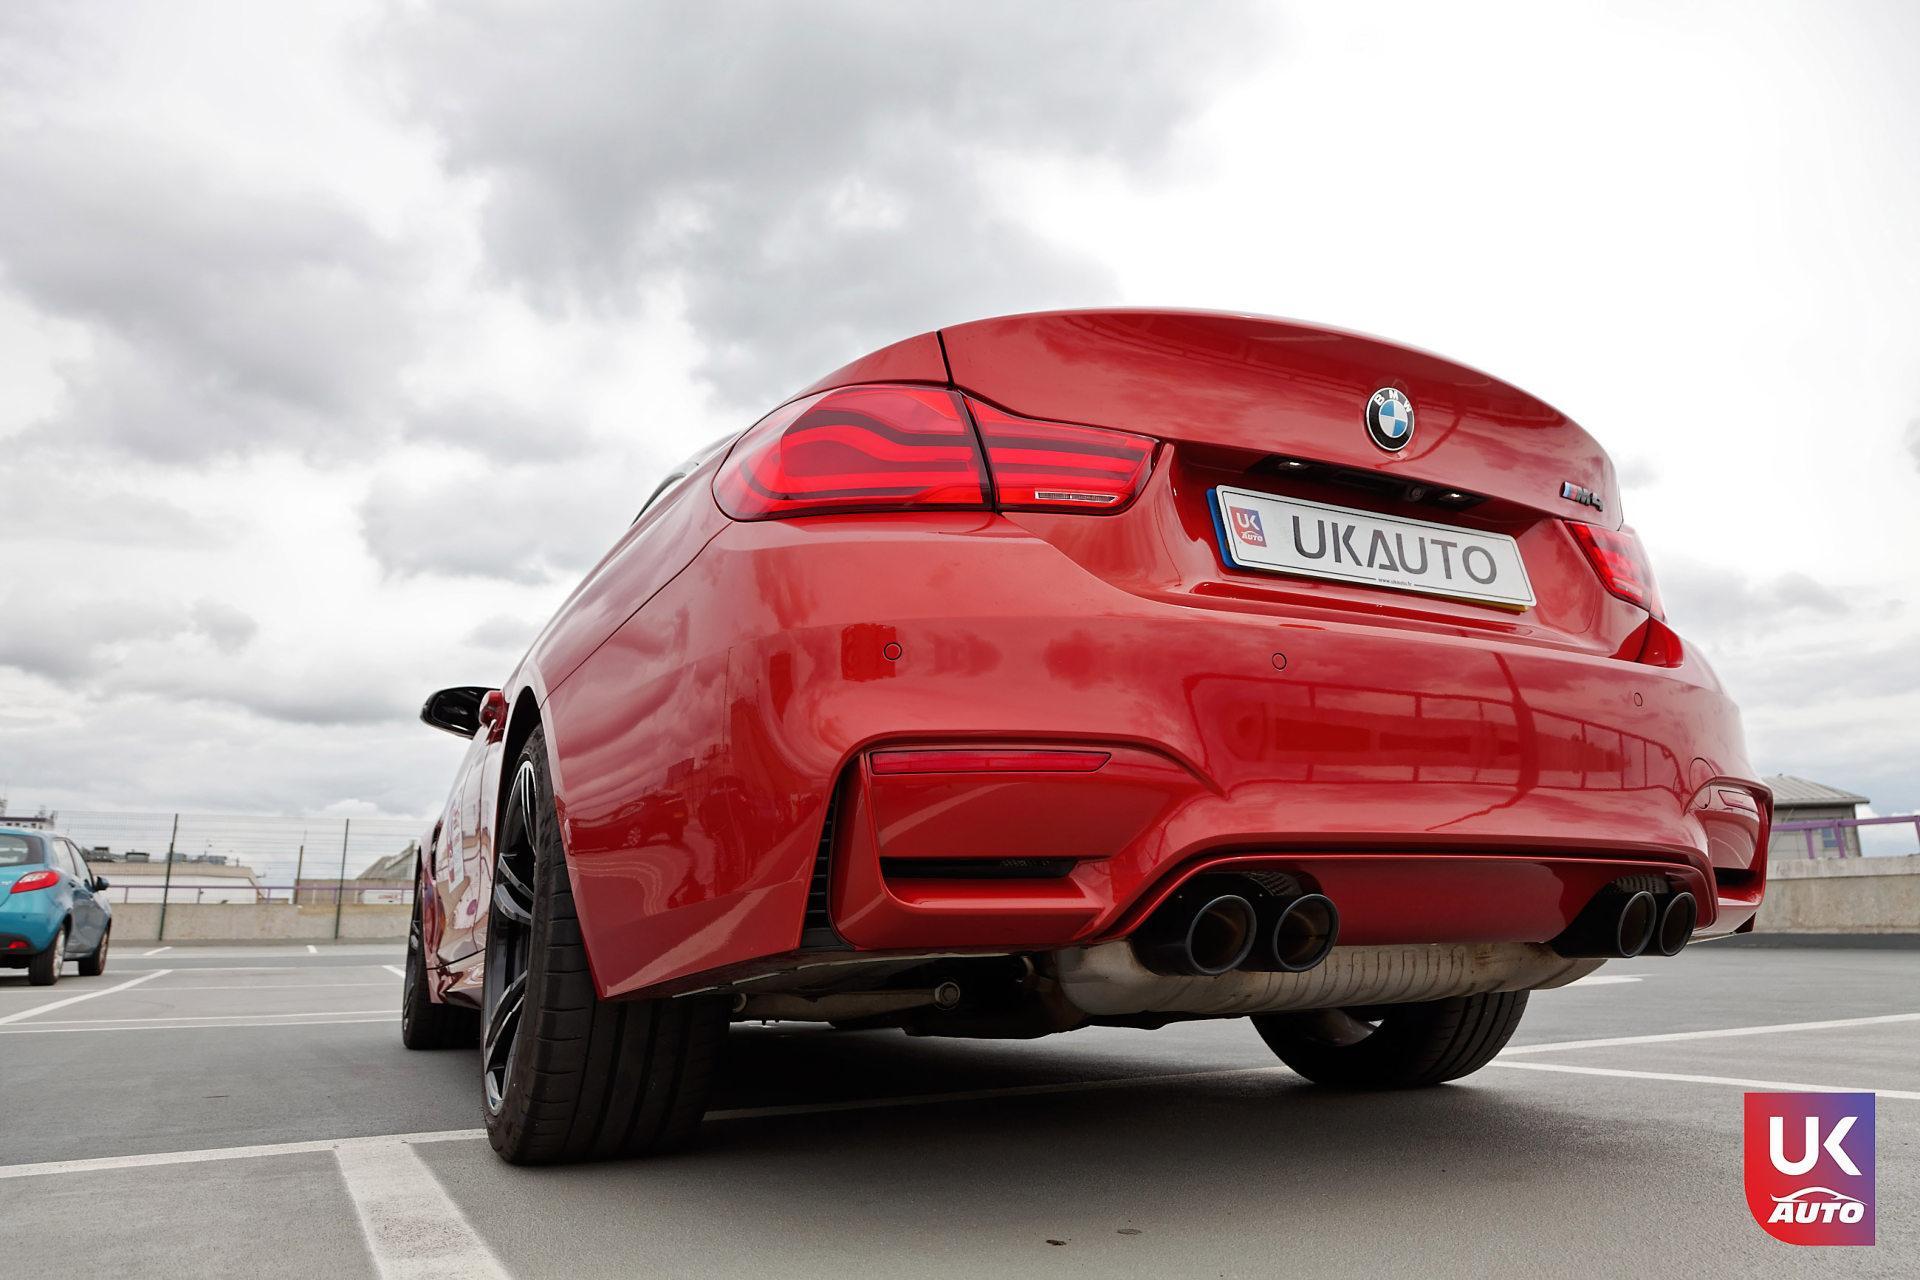 BMW M4 PACK COMPETITION BMW ANGLETERRE BMW IMPORT UK BMW MANDATAIRE AUTO12 DxO - IMPORTATION BMW M4 BMW IMPORT ROYAUME UNI BMW M4 COMPETITION RHD CLIENT UKAUTO